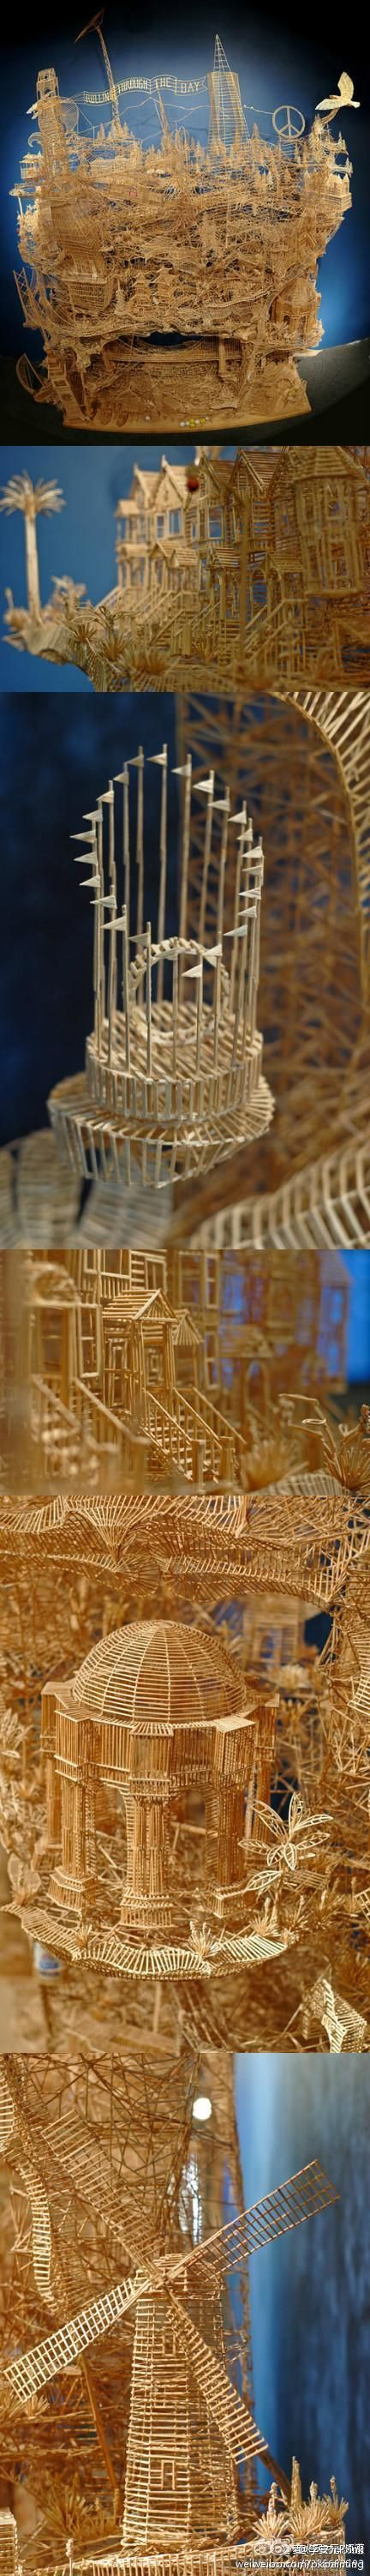 O Toothpick Art Crafts I 39 Ll Do Pinterest L 39 Wren